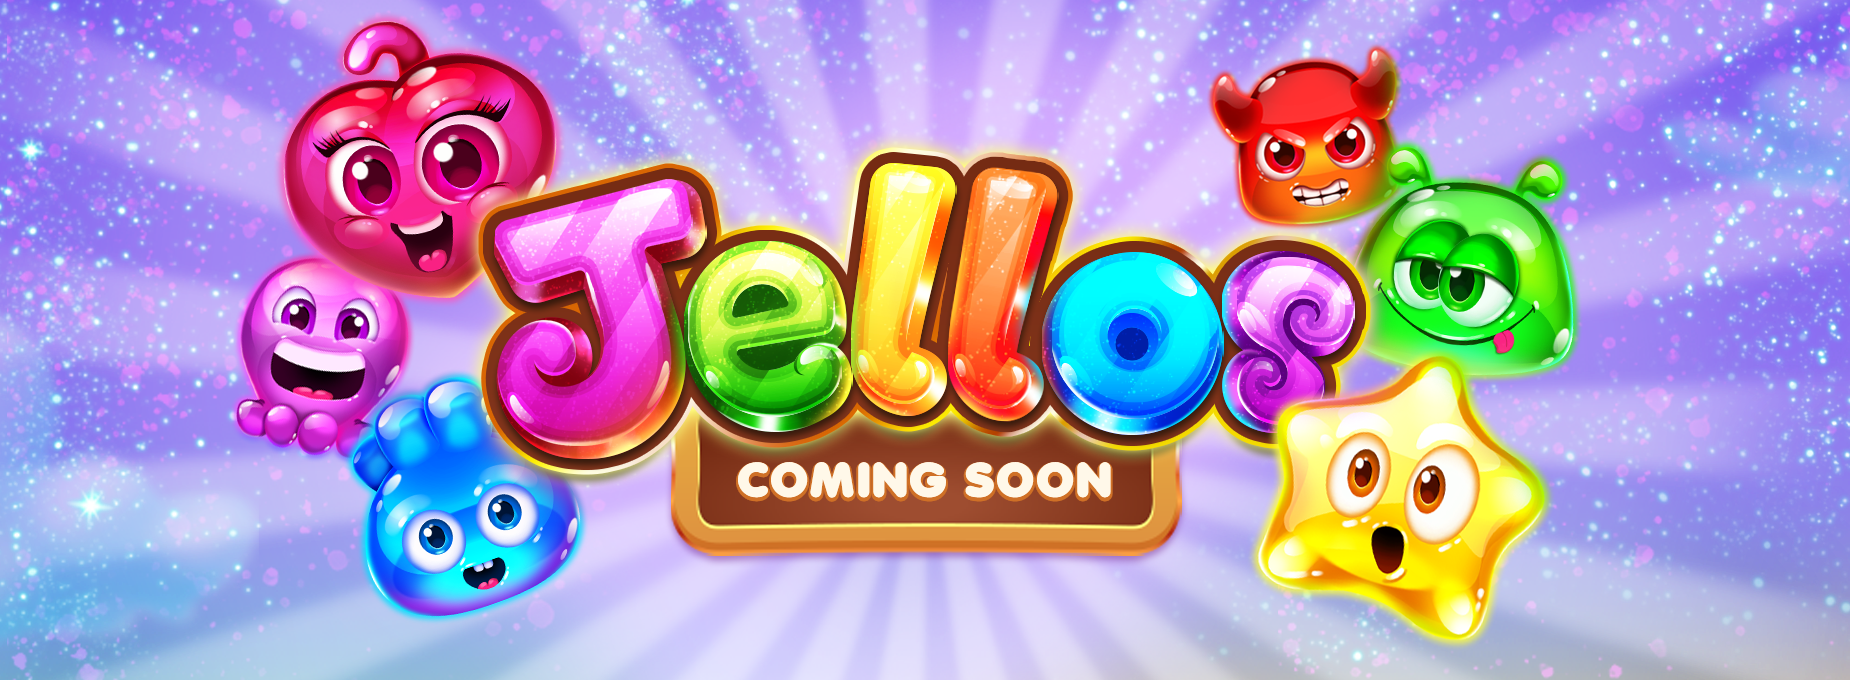 Hello Jellos